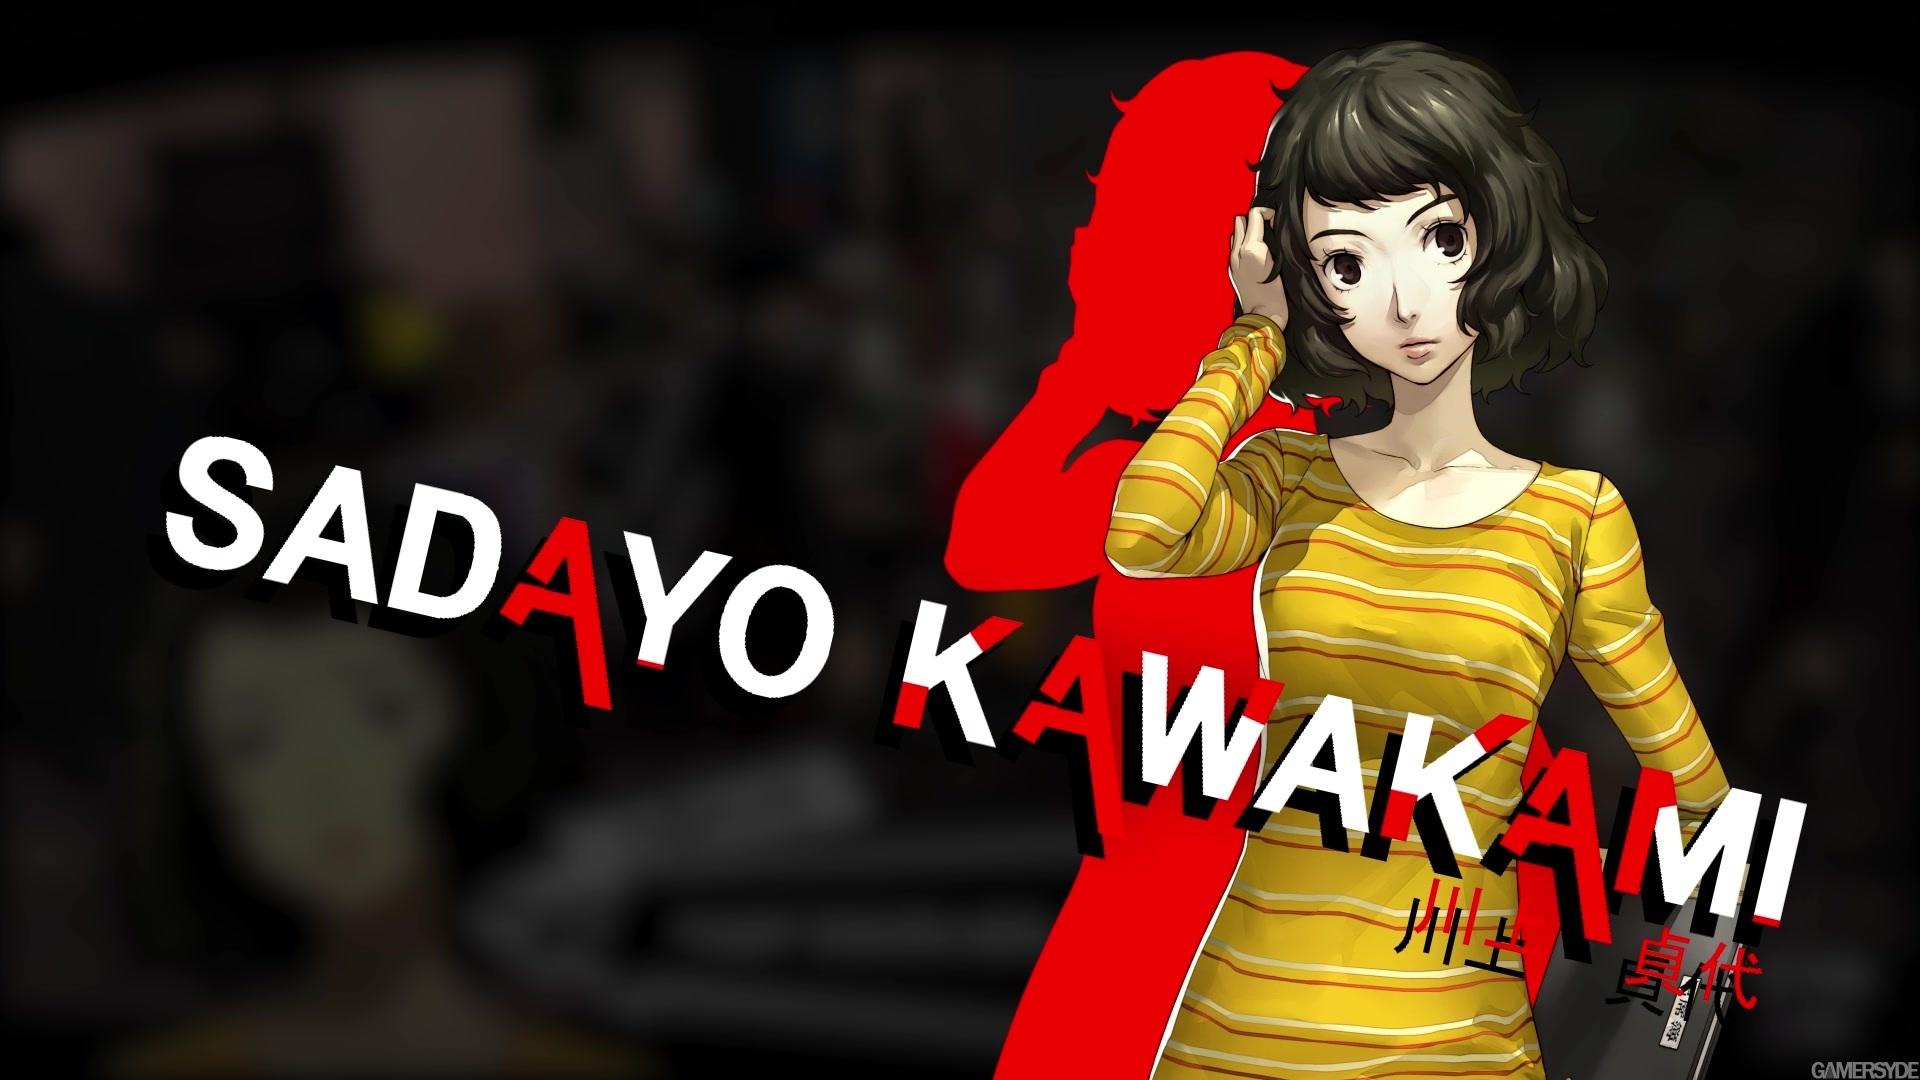 Sadayo Kawakami, Persona 5